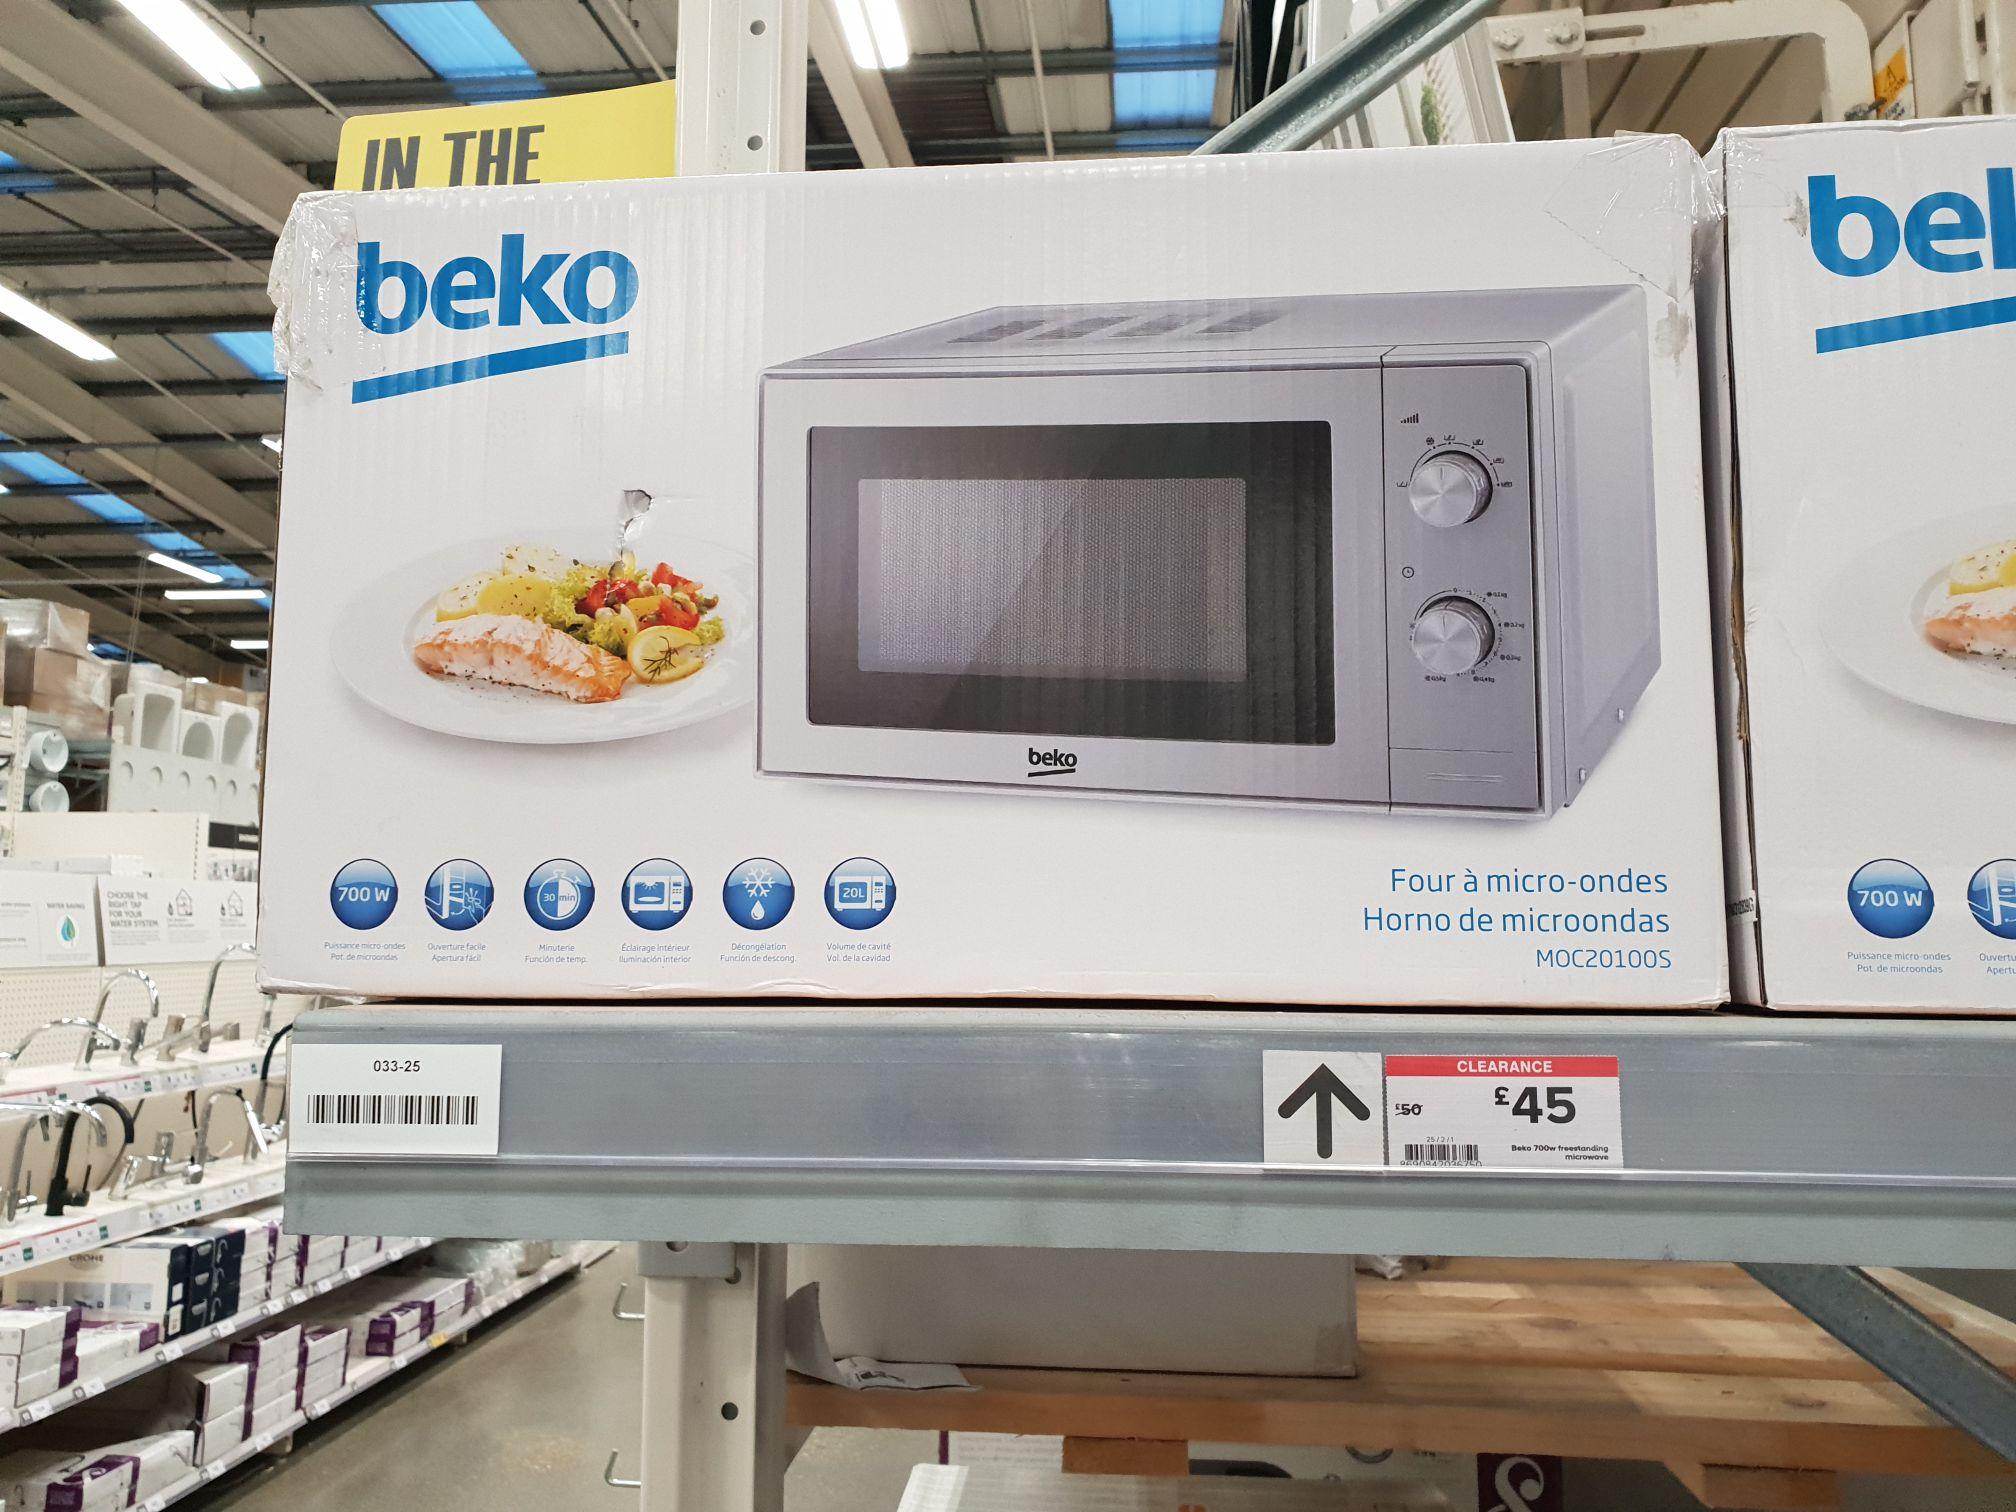 Beko 700w microwave £45 @ B&Q Lakeside